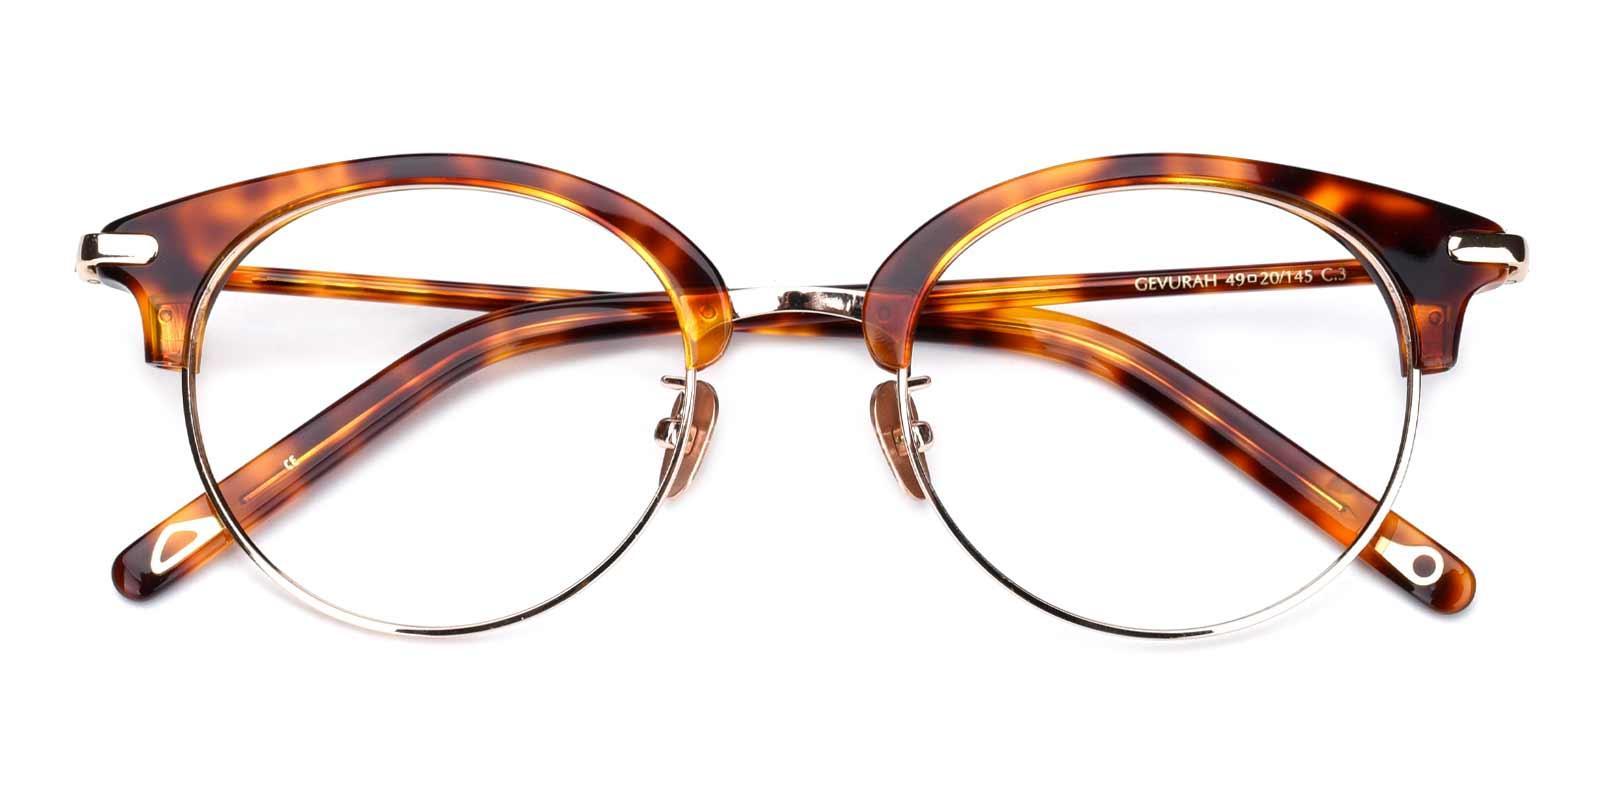 Jodie-Tortoise-Browline-Titanium-Eyeglasses-detail